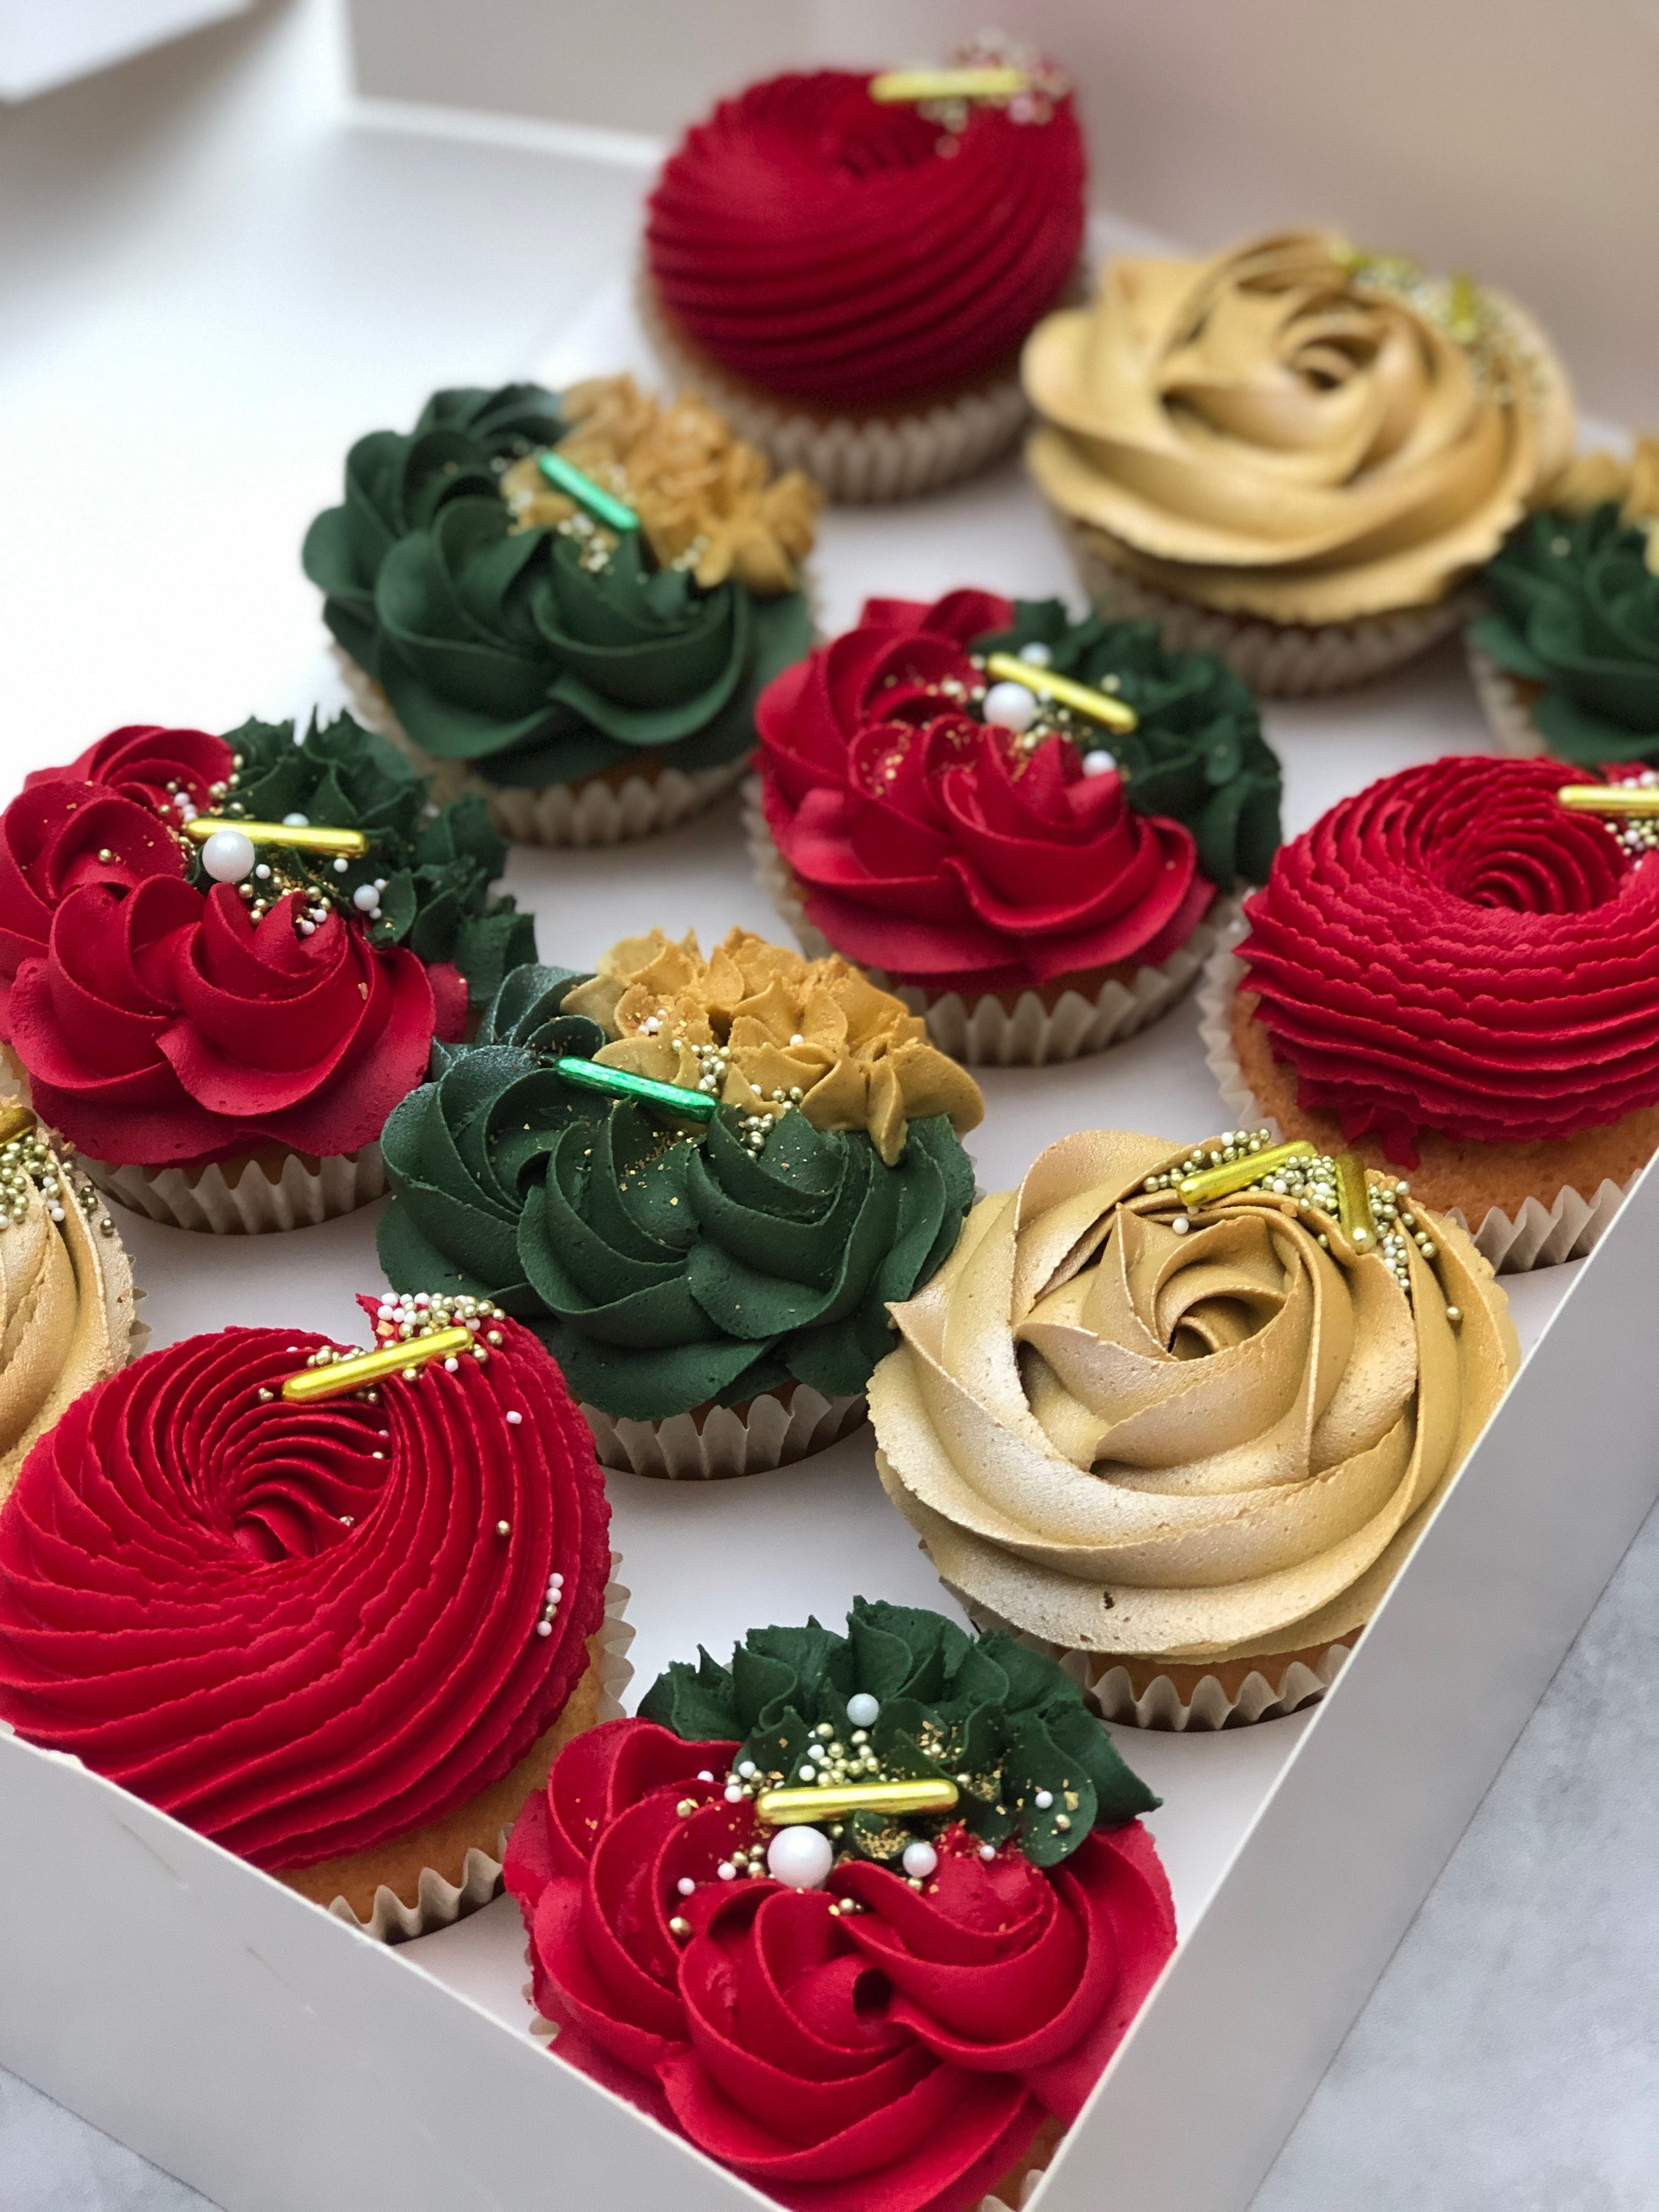 Learn The Taylor Made Way | Christmas cake pops, Holiday cupcakes, Christmas cake